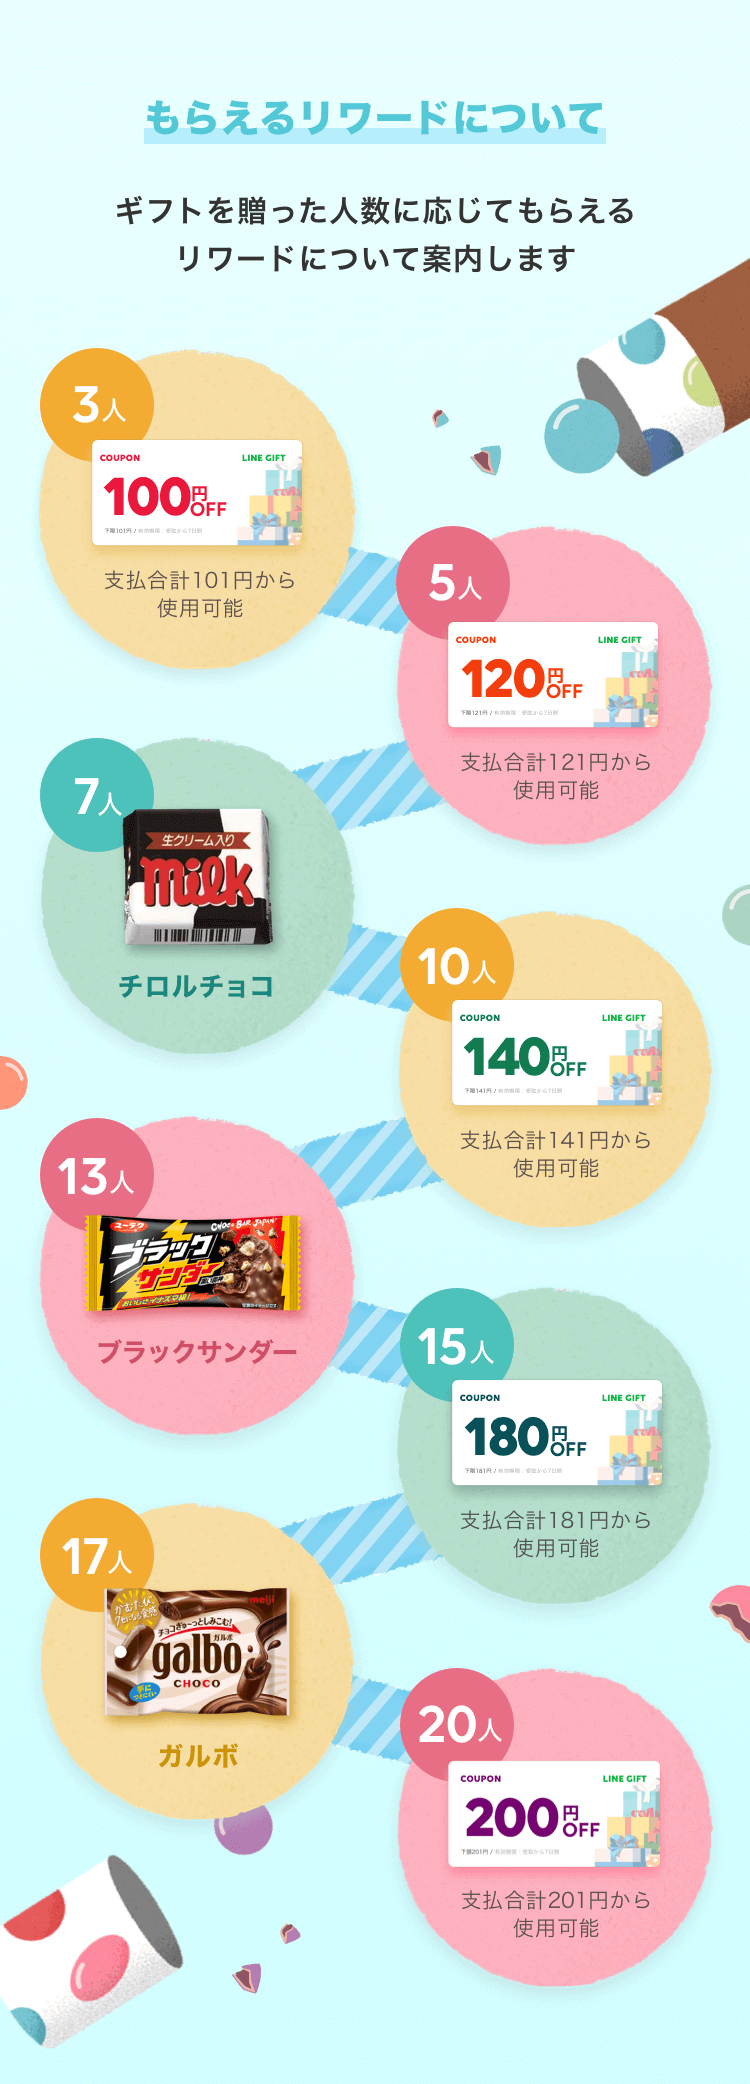 LINEギフトで義理ギフトを友人に贈りまくると100円クーポンなどが貰える「チョコっとギフトラリー」を開催中。〜2/15。